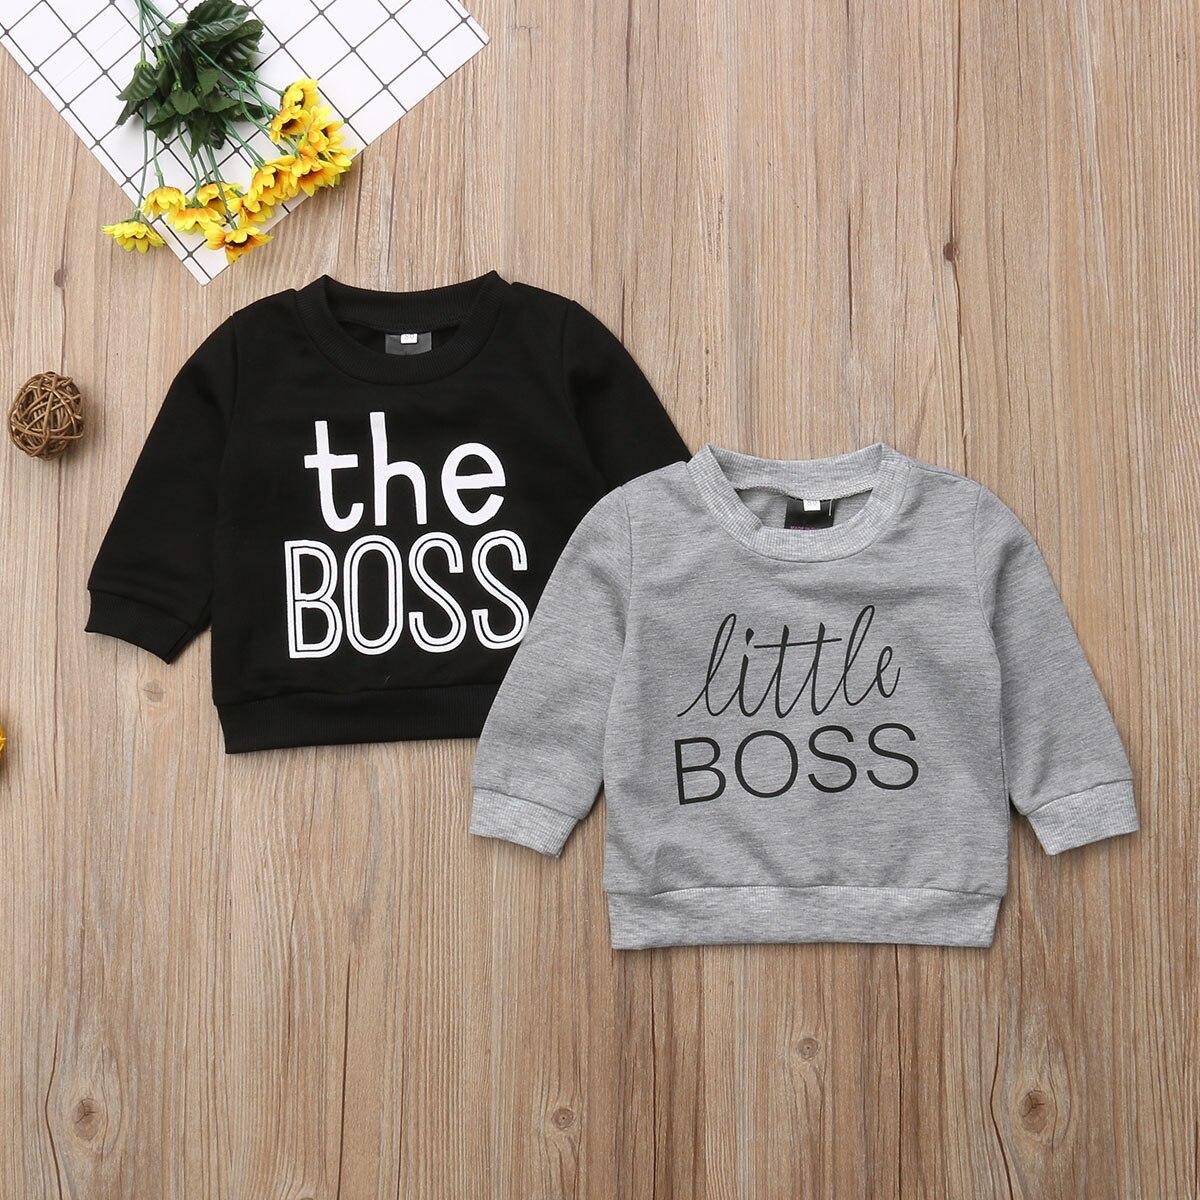 0fae2ac97 Brand New Toddler Kid Baby Boys Girls Long Sleeve T shirts Little Boss  Black Gray Sweatsuit Sweatshirt Autumn 0-5Y